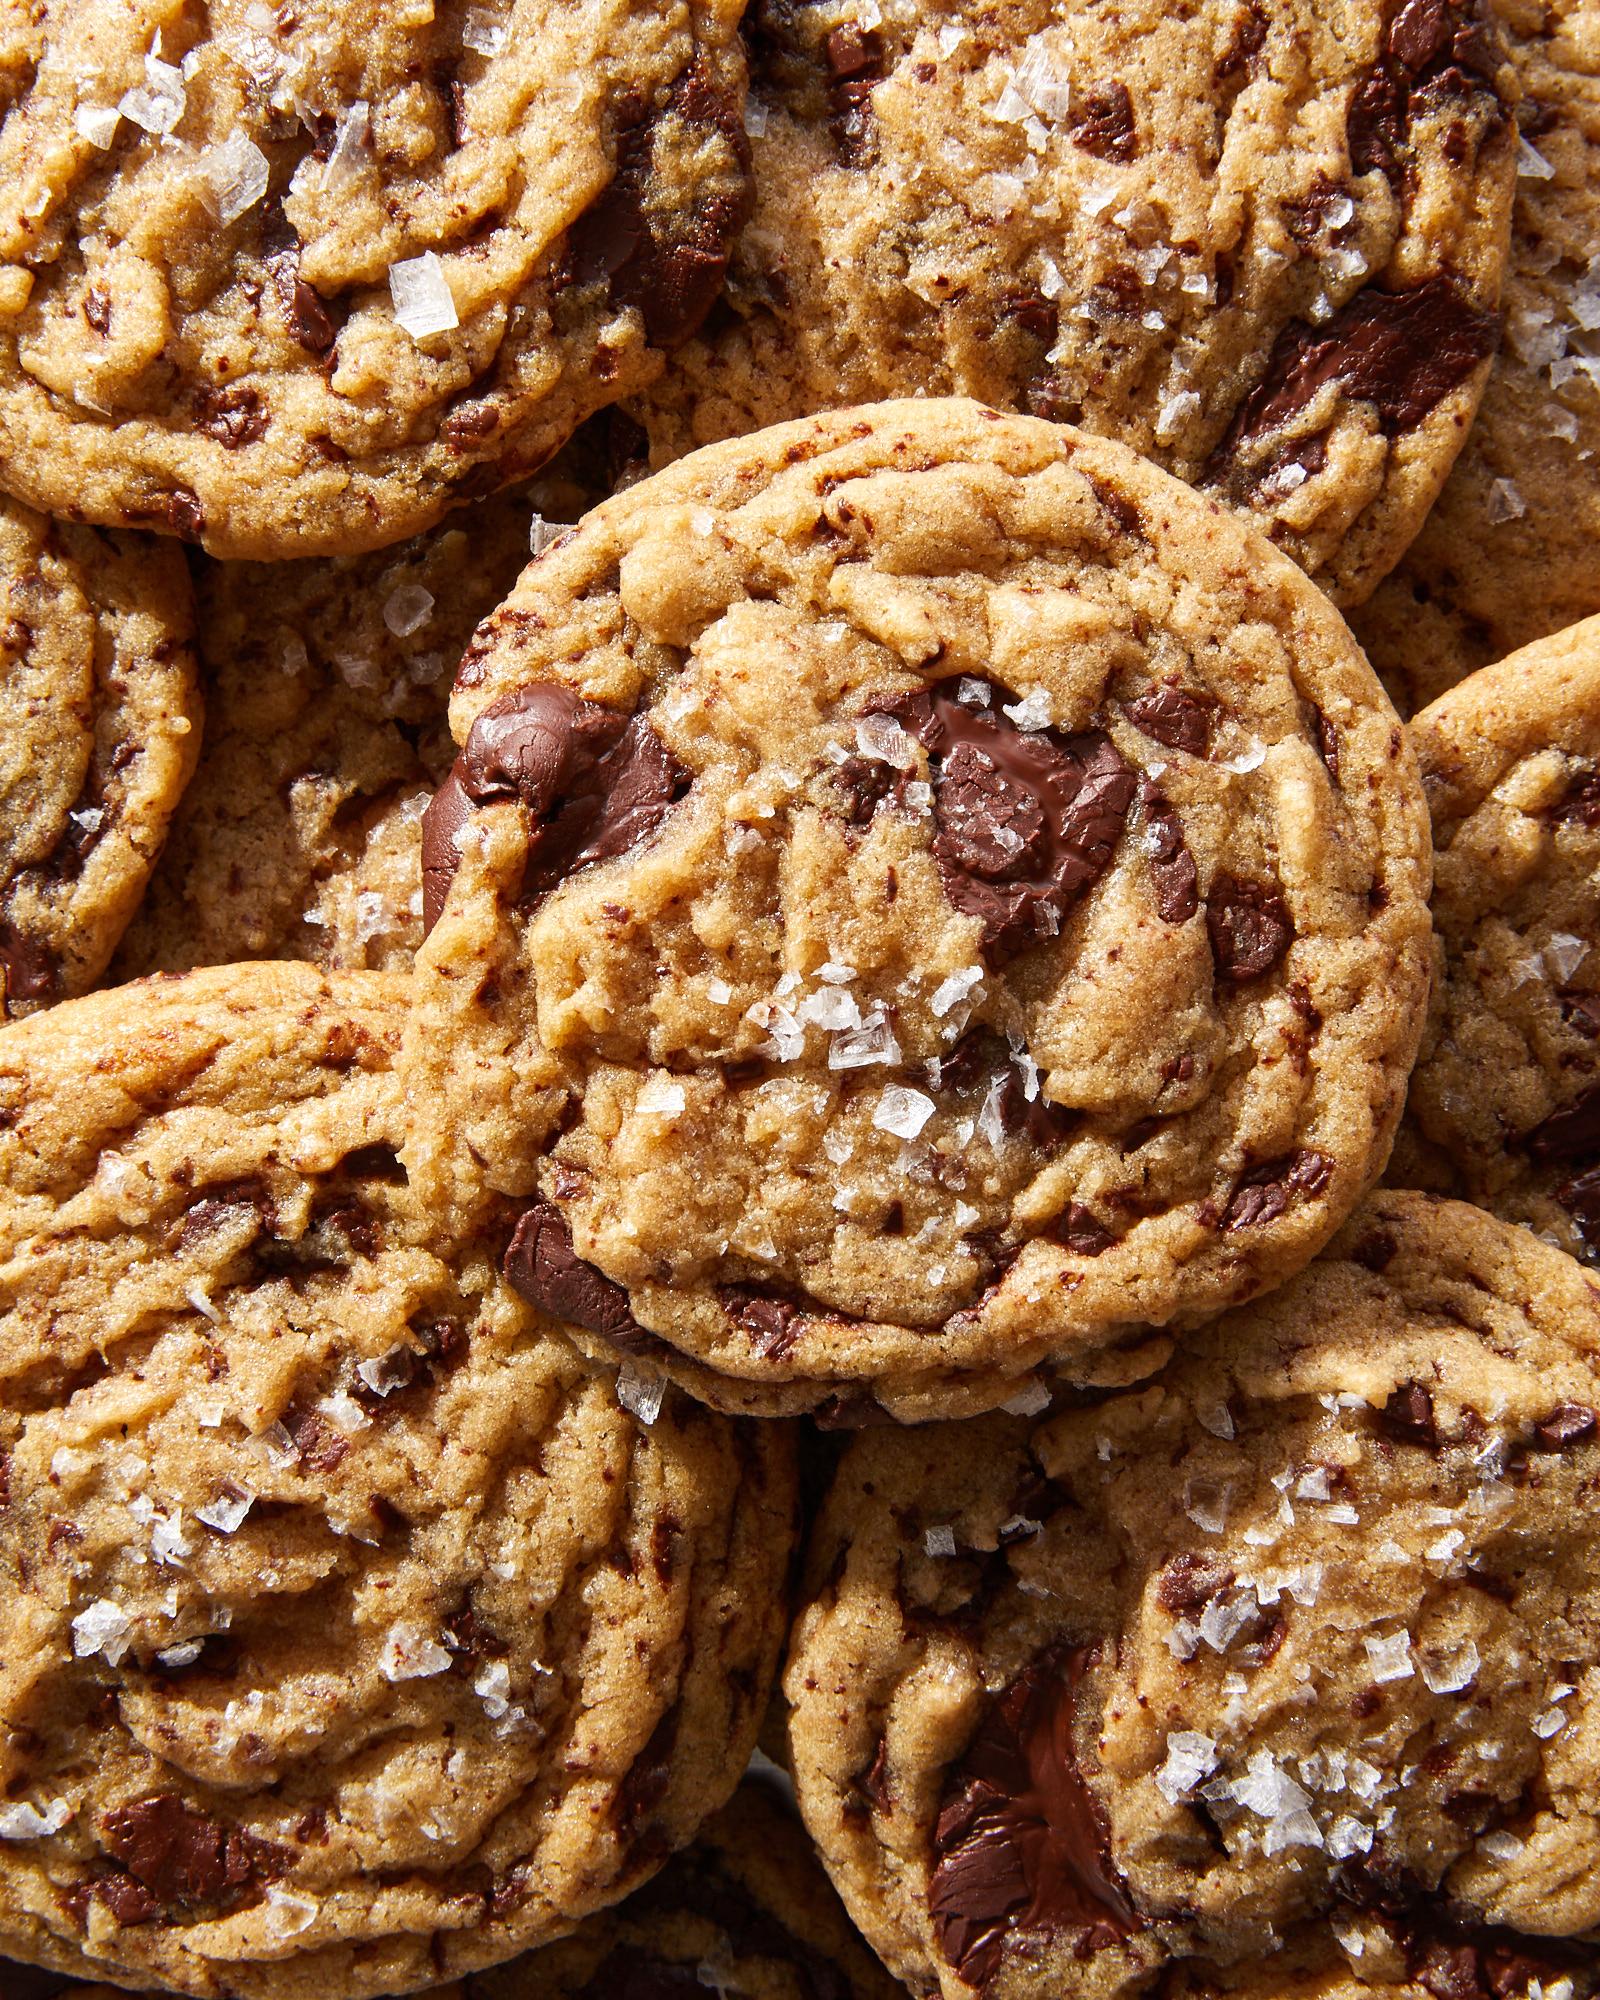 Chocolatechip-Cookie_Macro_Hoilday-Gift-Guide_8958.jpg